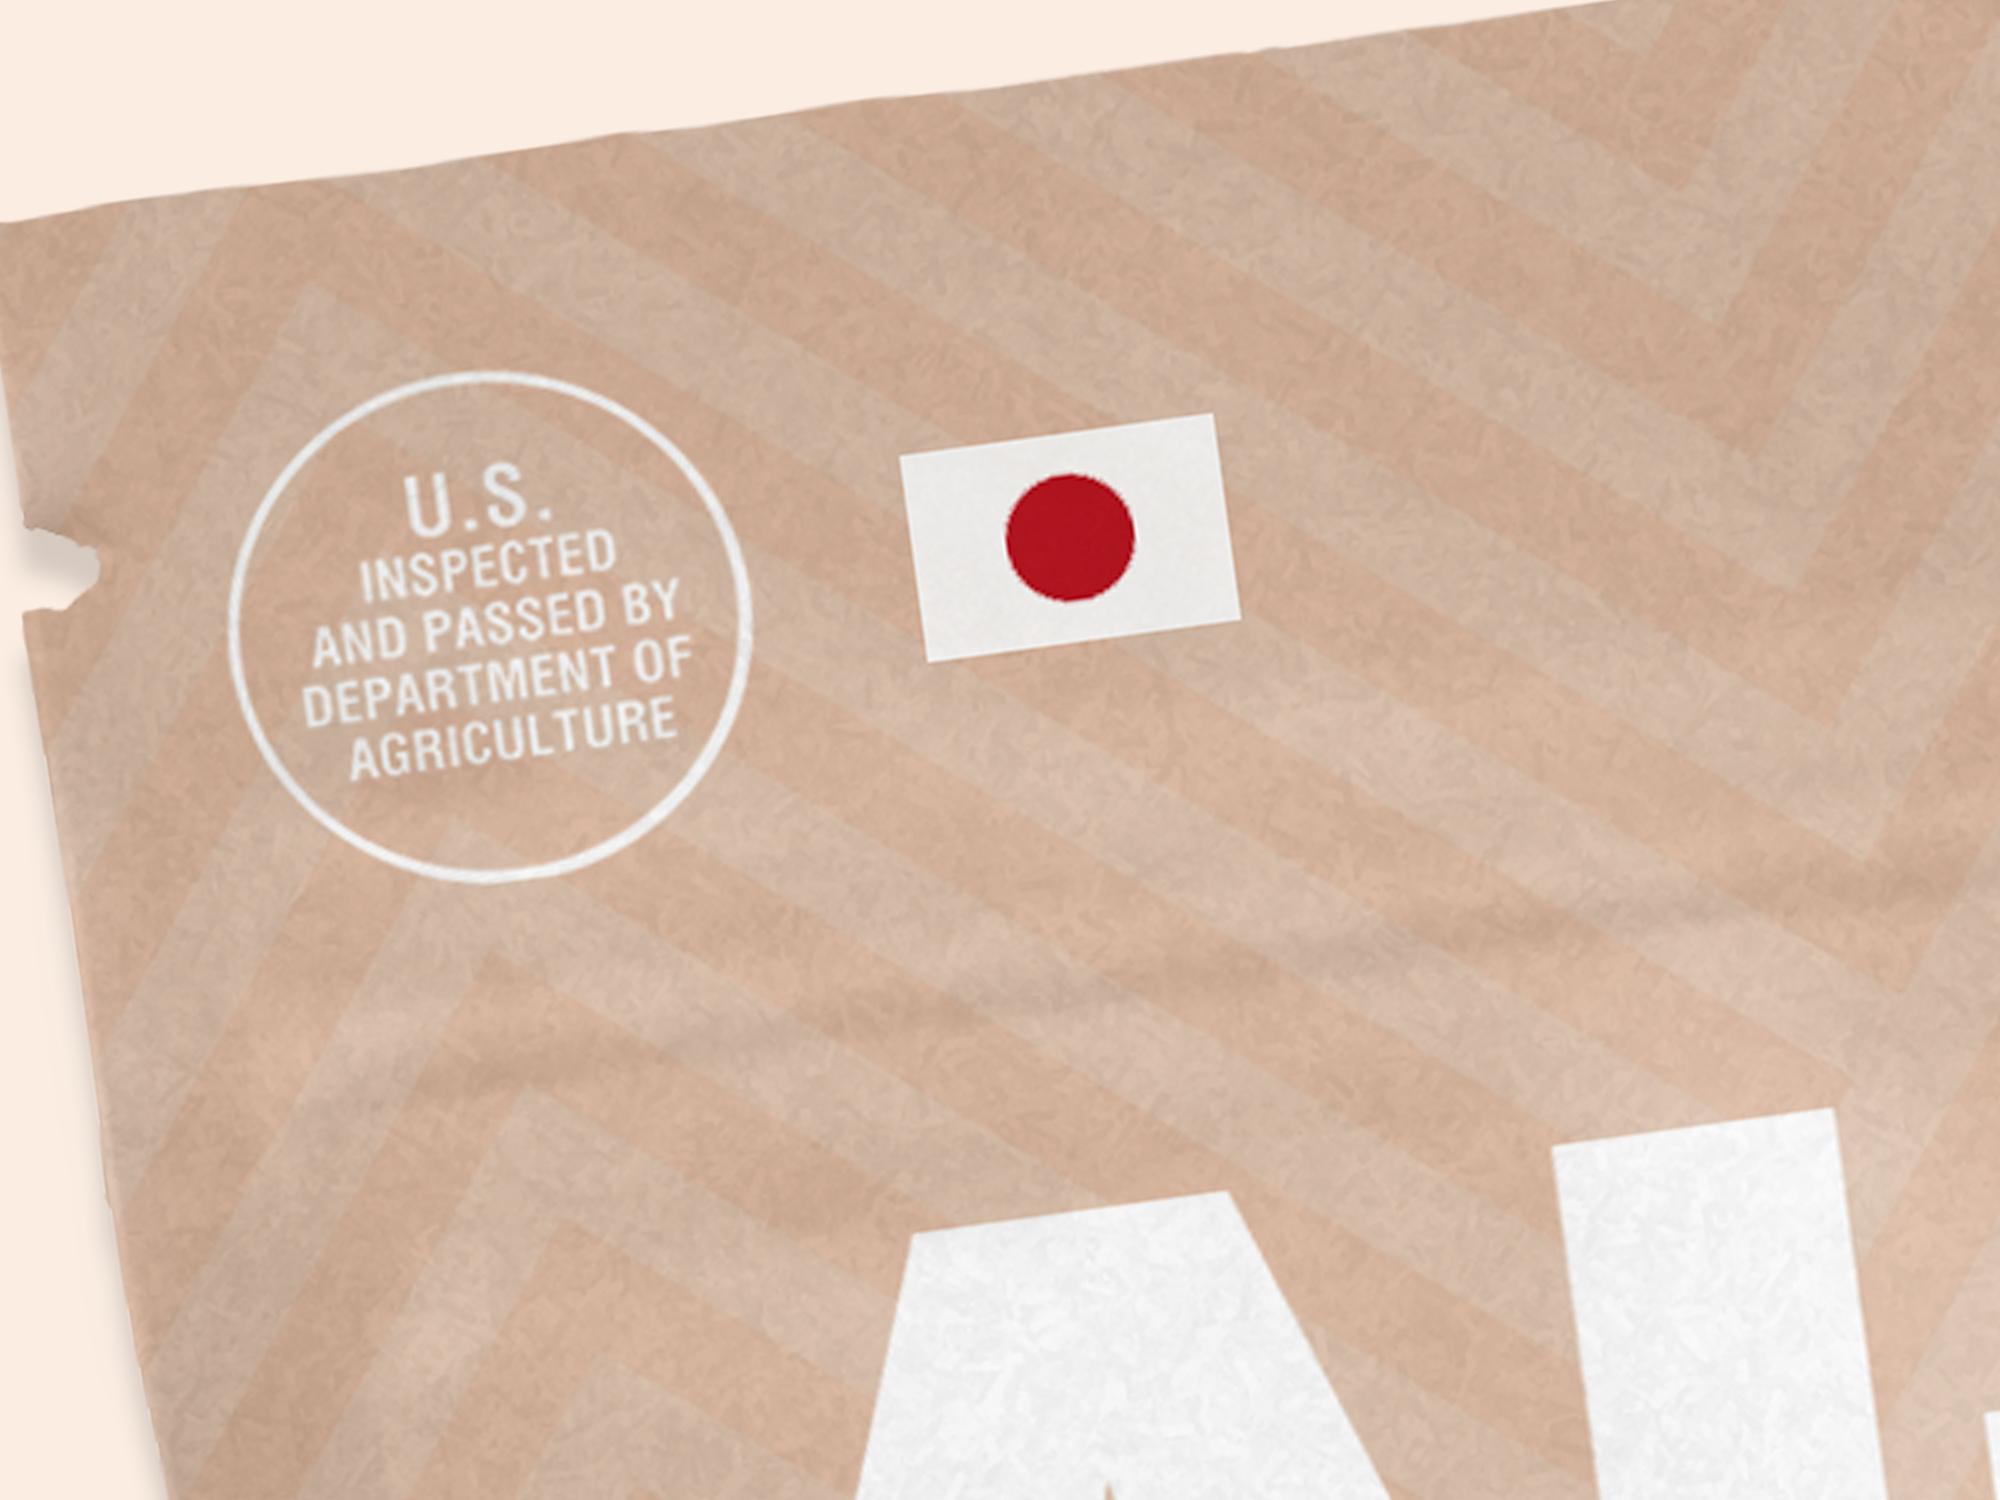 packaging-close-ups-top-country.jpg